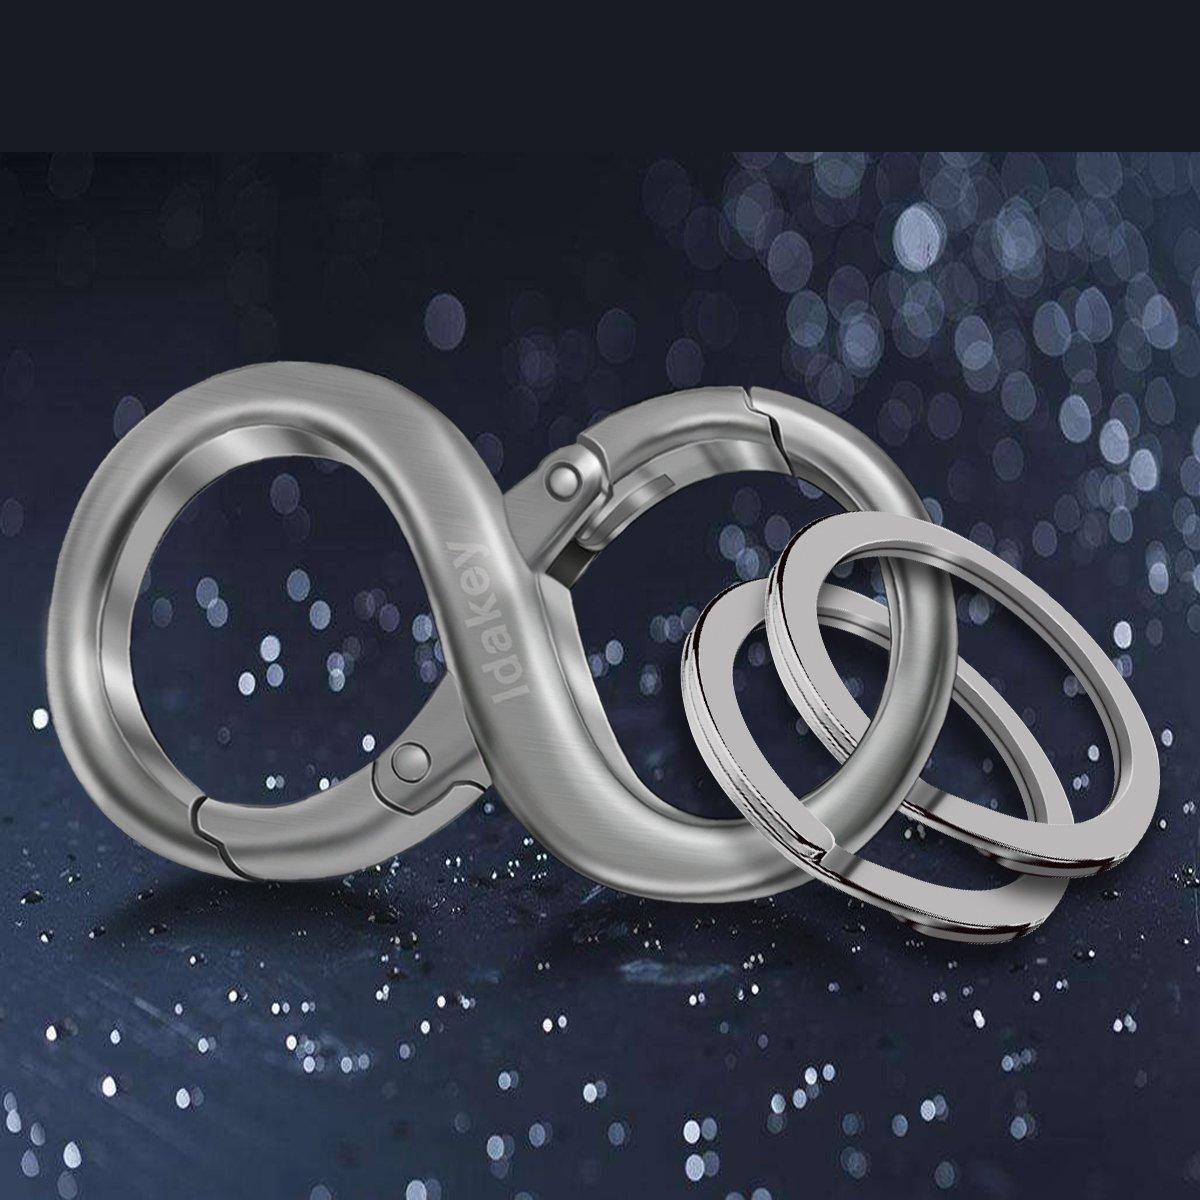 Idakey Zinc Alloy Detachable Key Chain with 2 Extra Key Rings Premium 8 Shape Car Business Keychain for Men and Women Grey